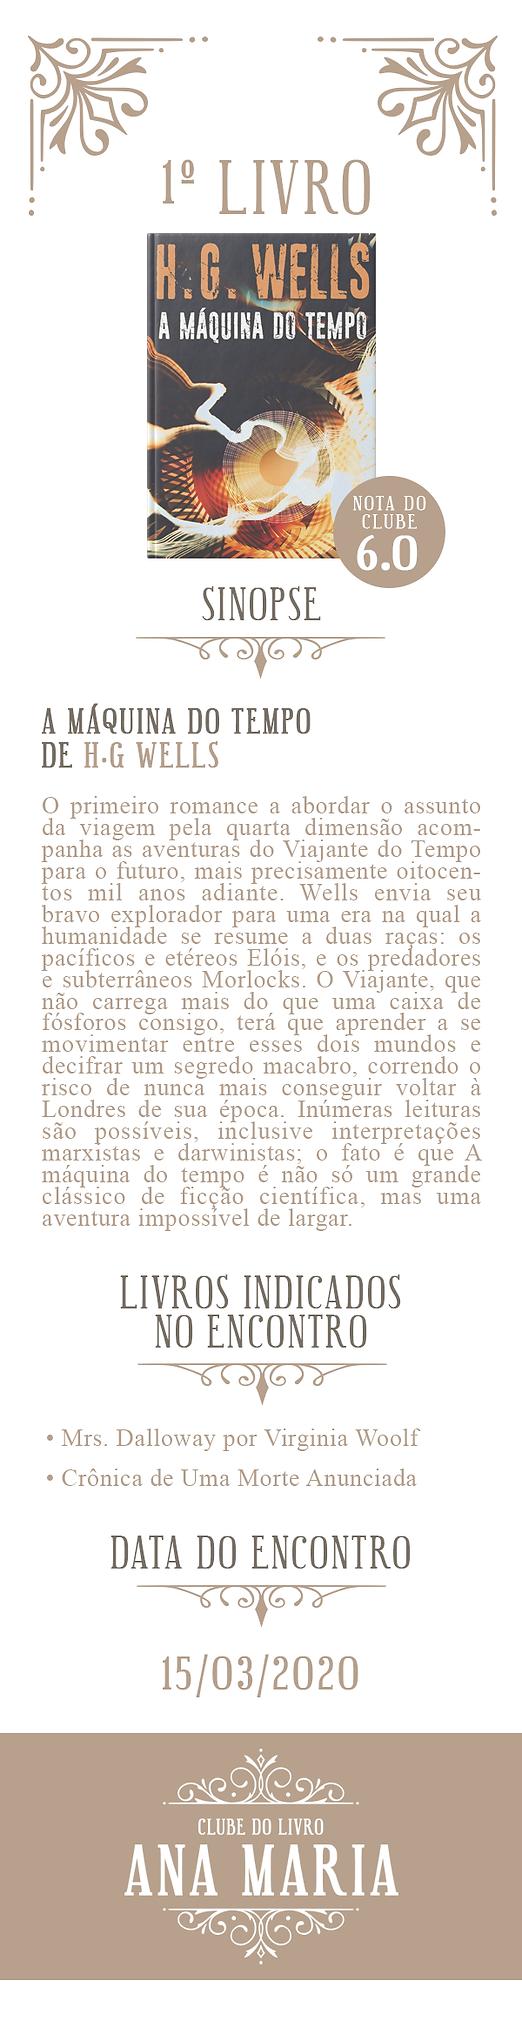 livro-1.png